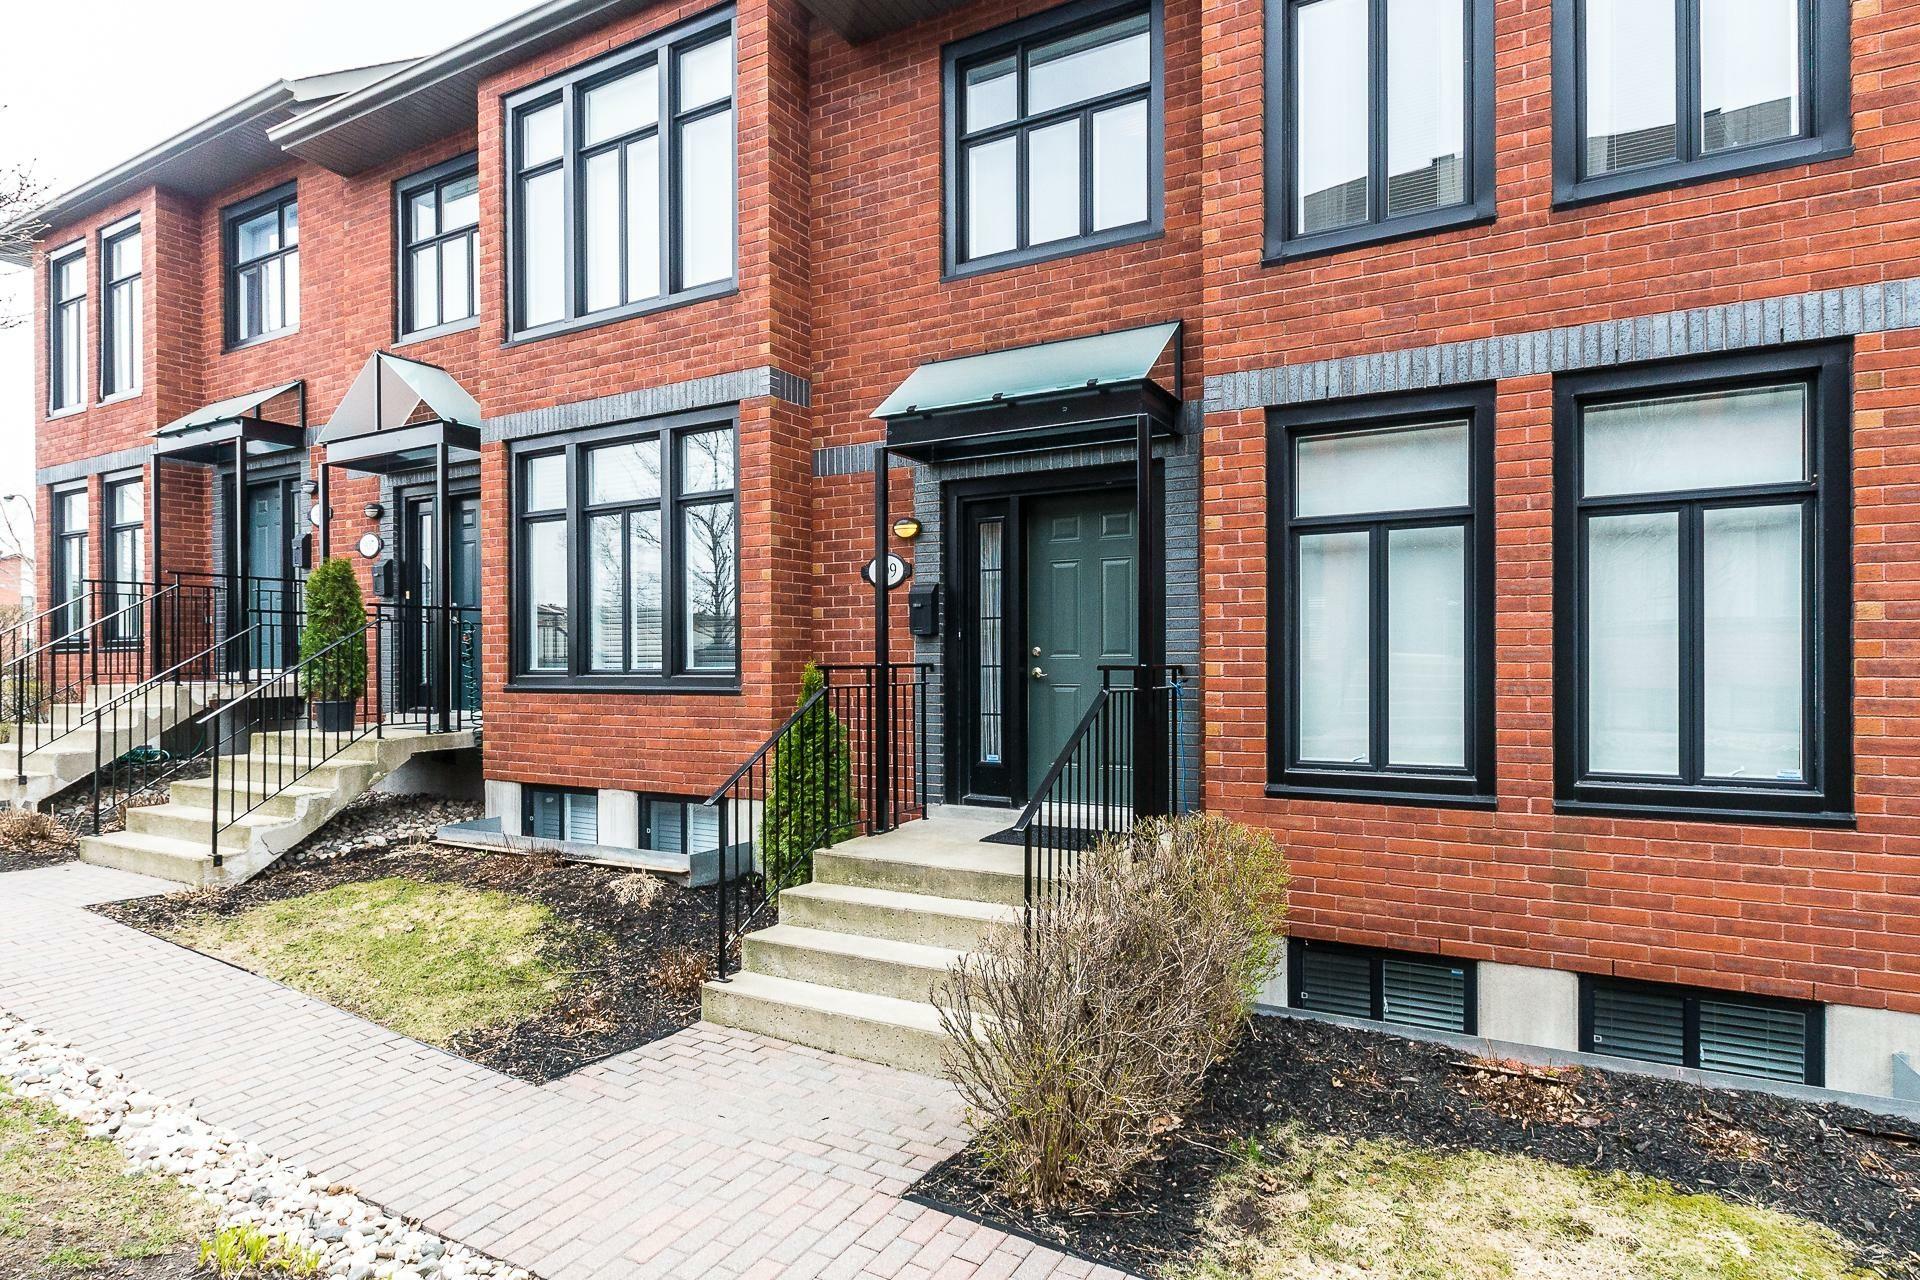 image 30 - MX - Casa sola - MX En venta Montréal Lachine  - 8 habitaciones